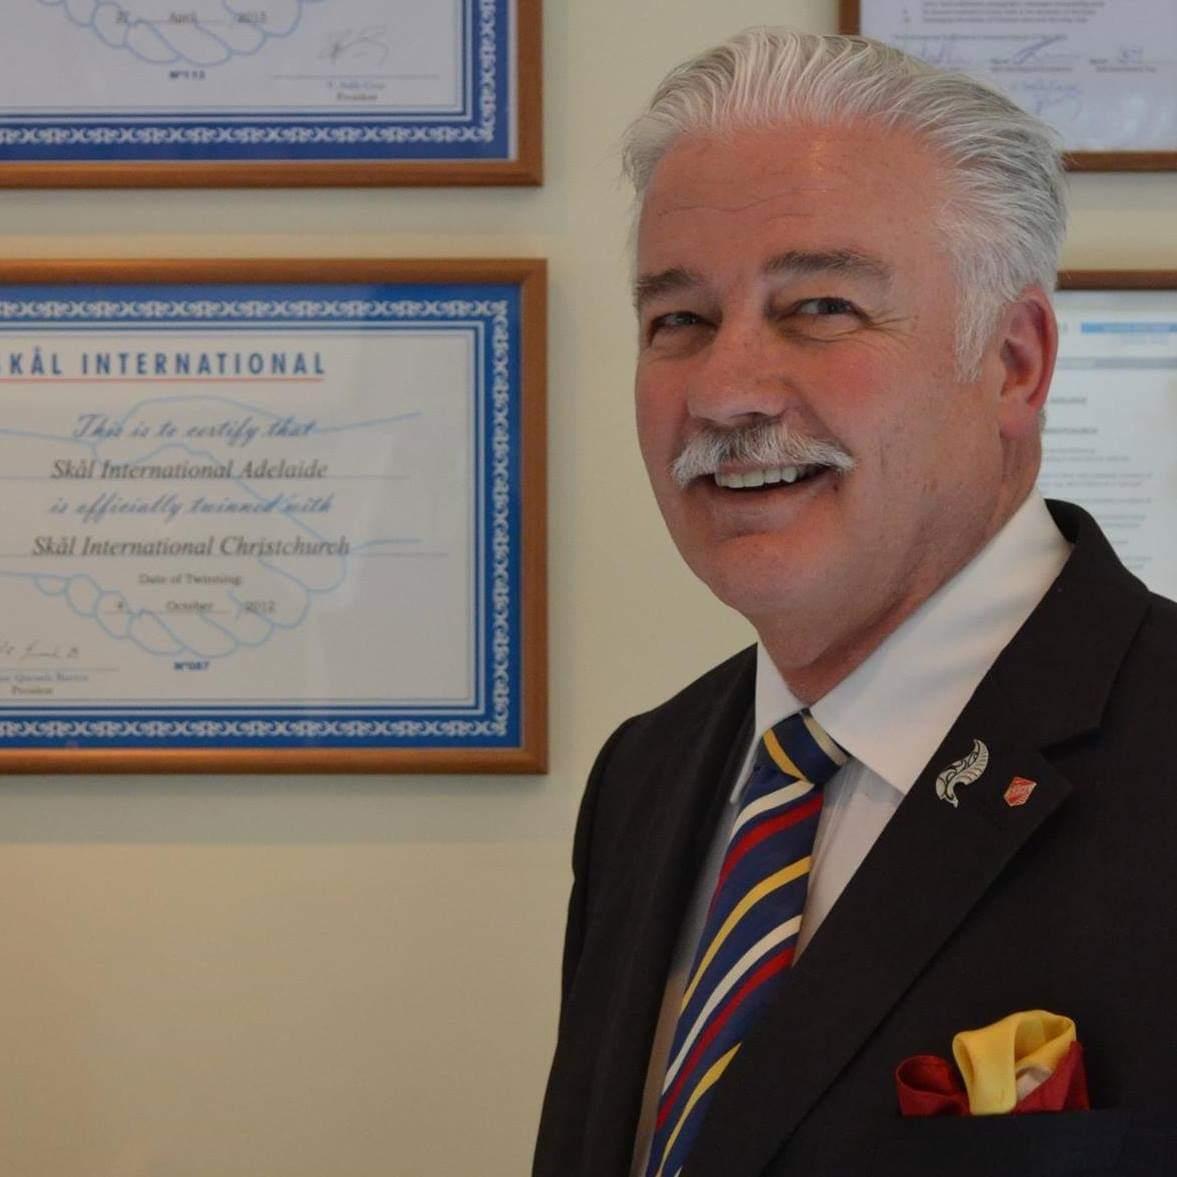 Peter Morrison, Skal International, New Zealand & 102 countries